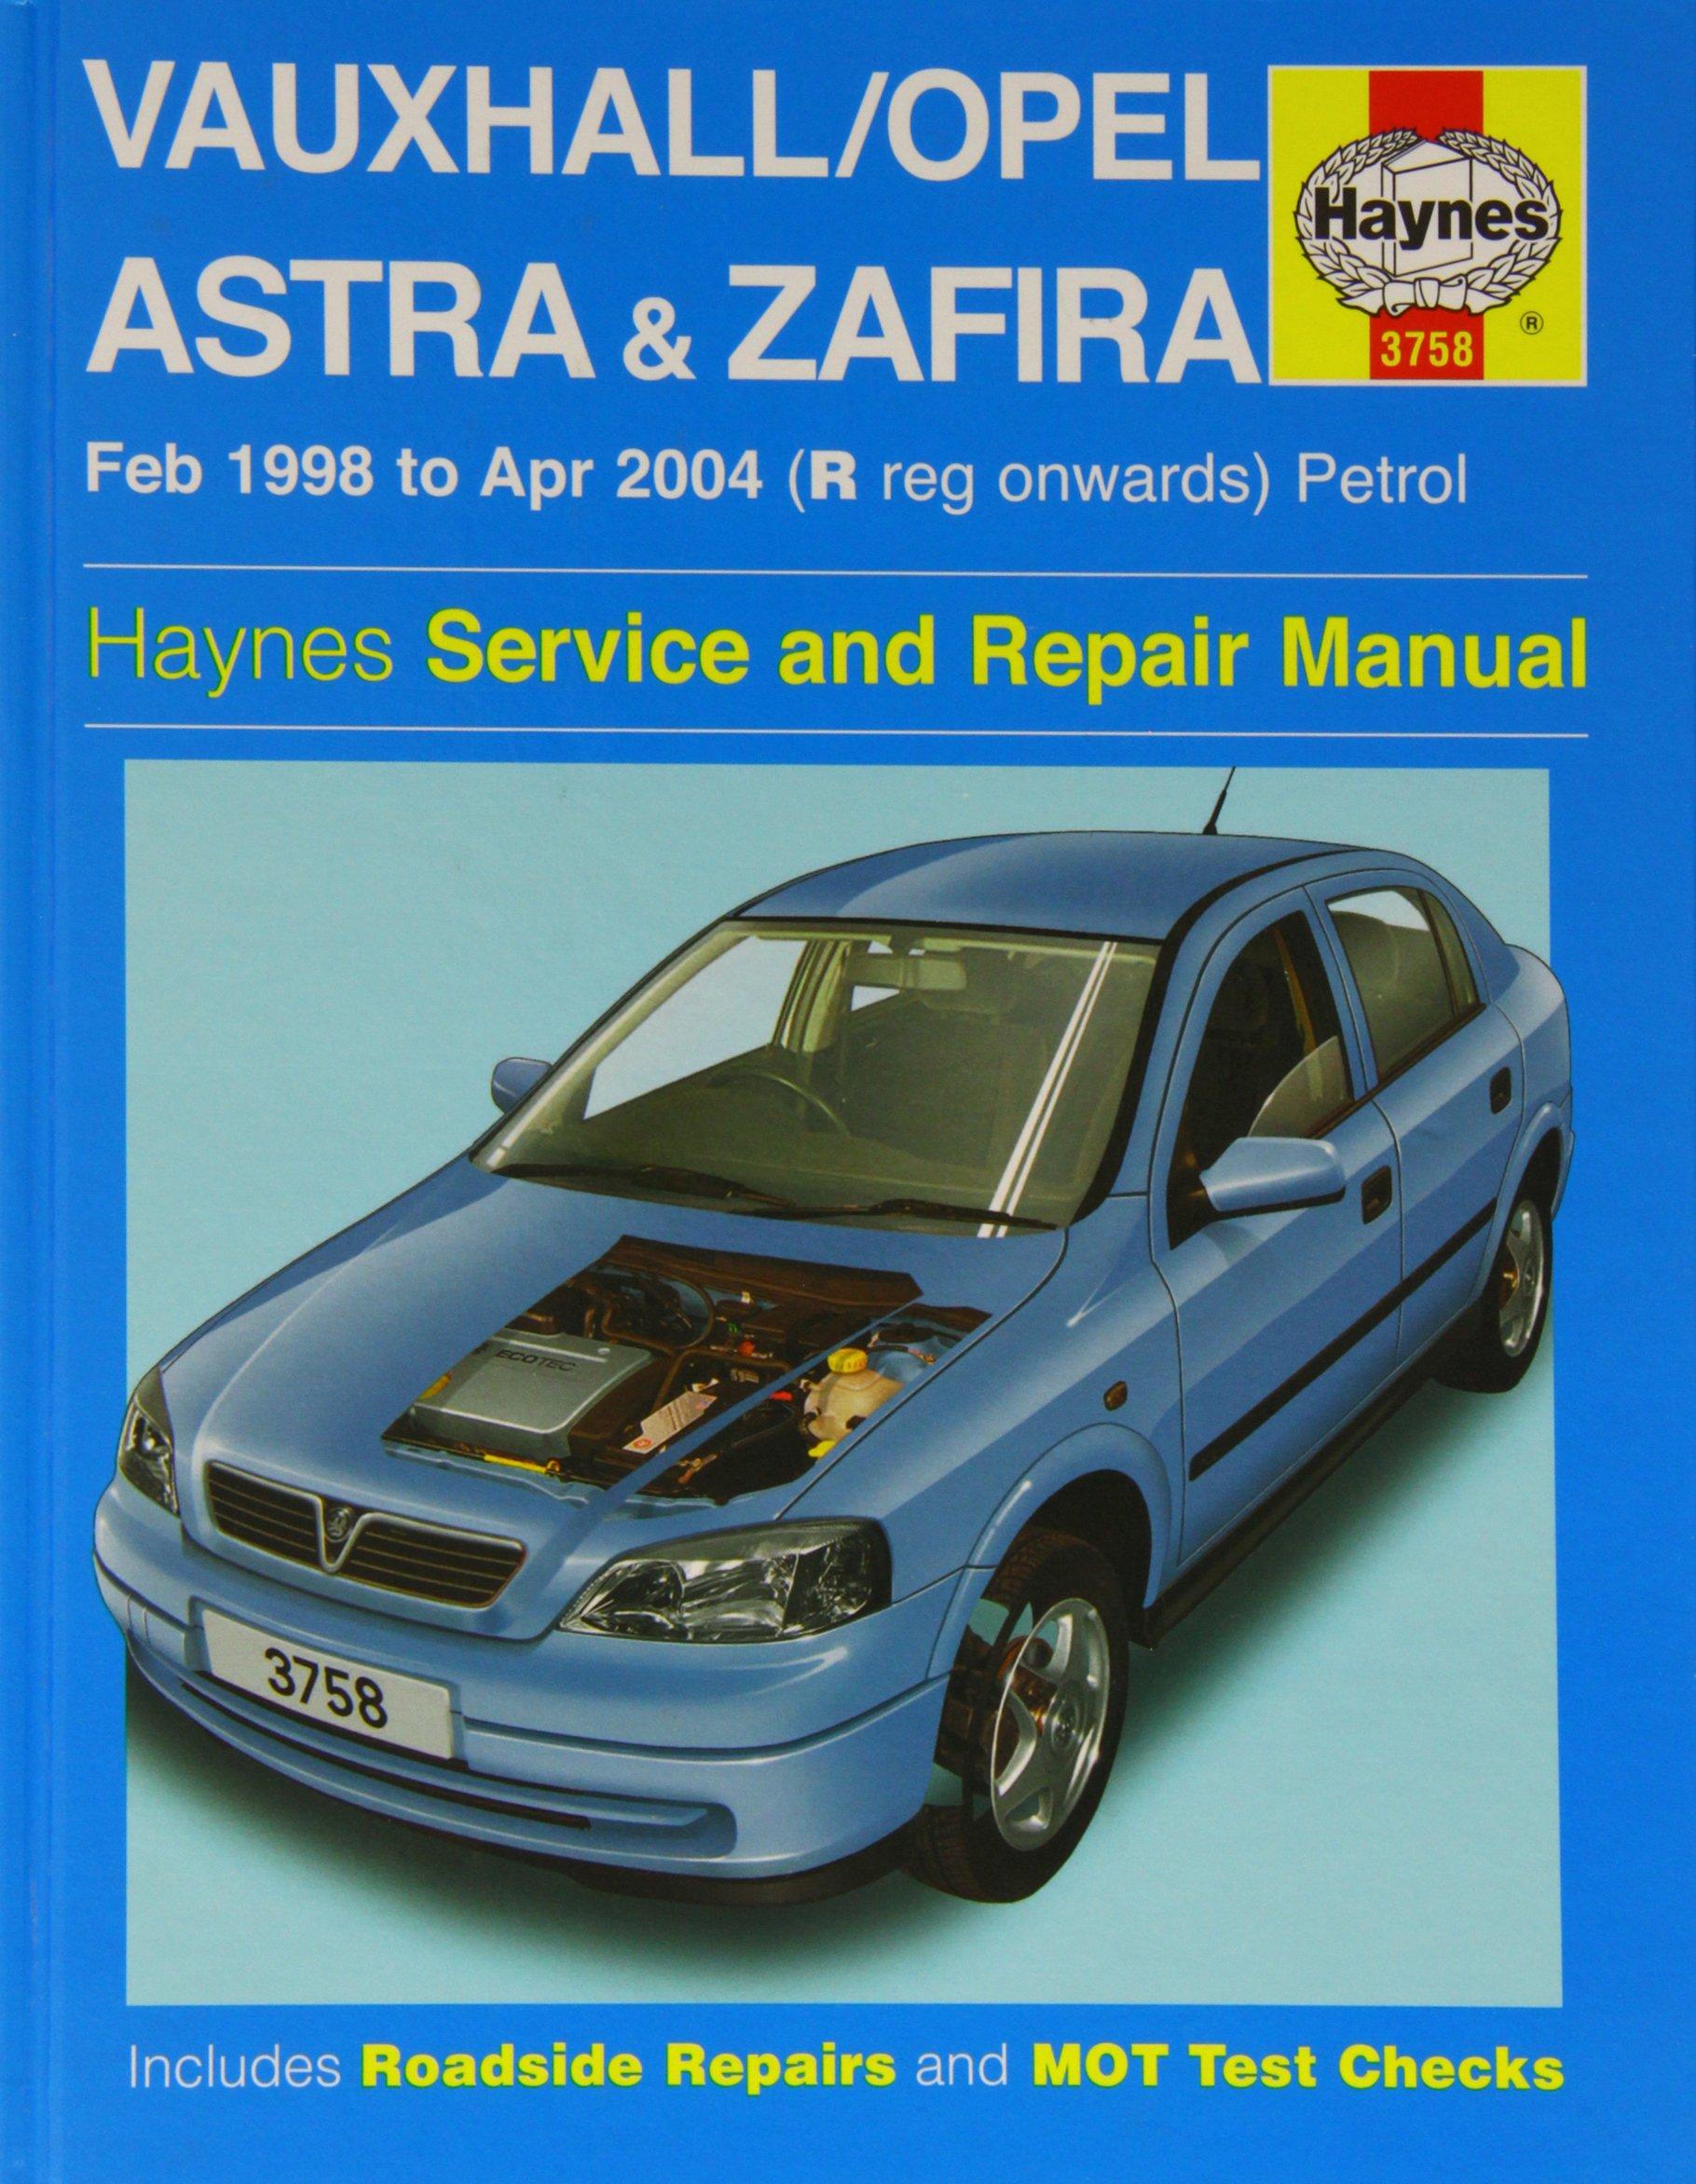 haynes 3758 owners and workshop car manual amazon co uk rh amazon co uk vauxhall astra g owners manual pdf astra g owners manual pdf